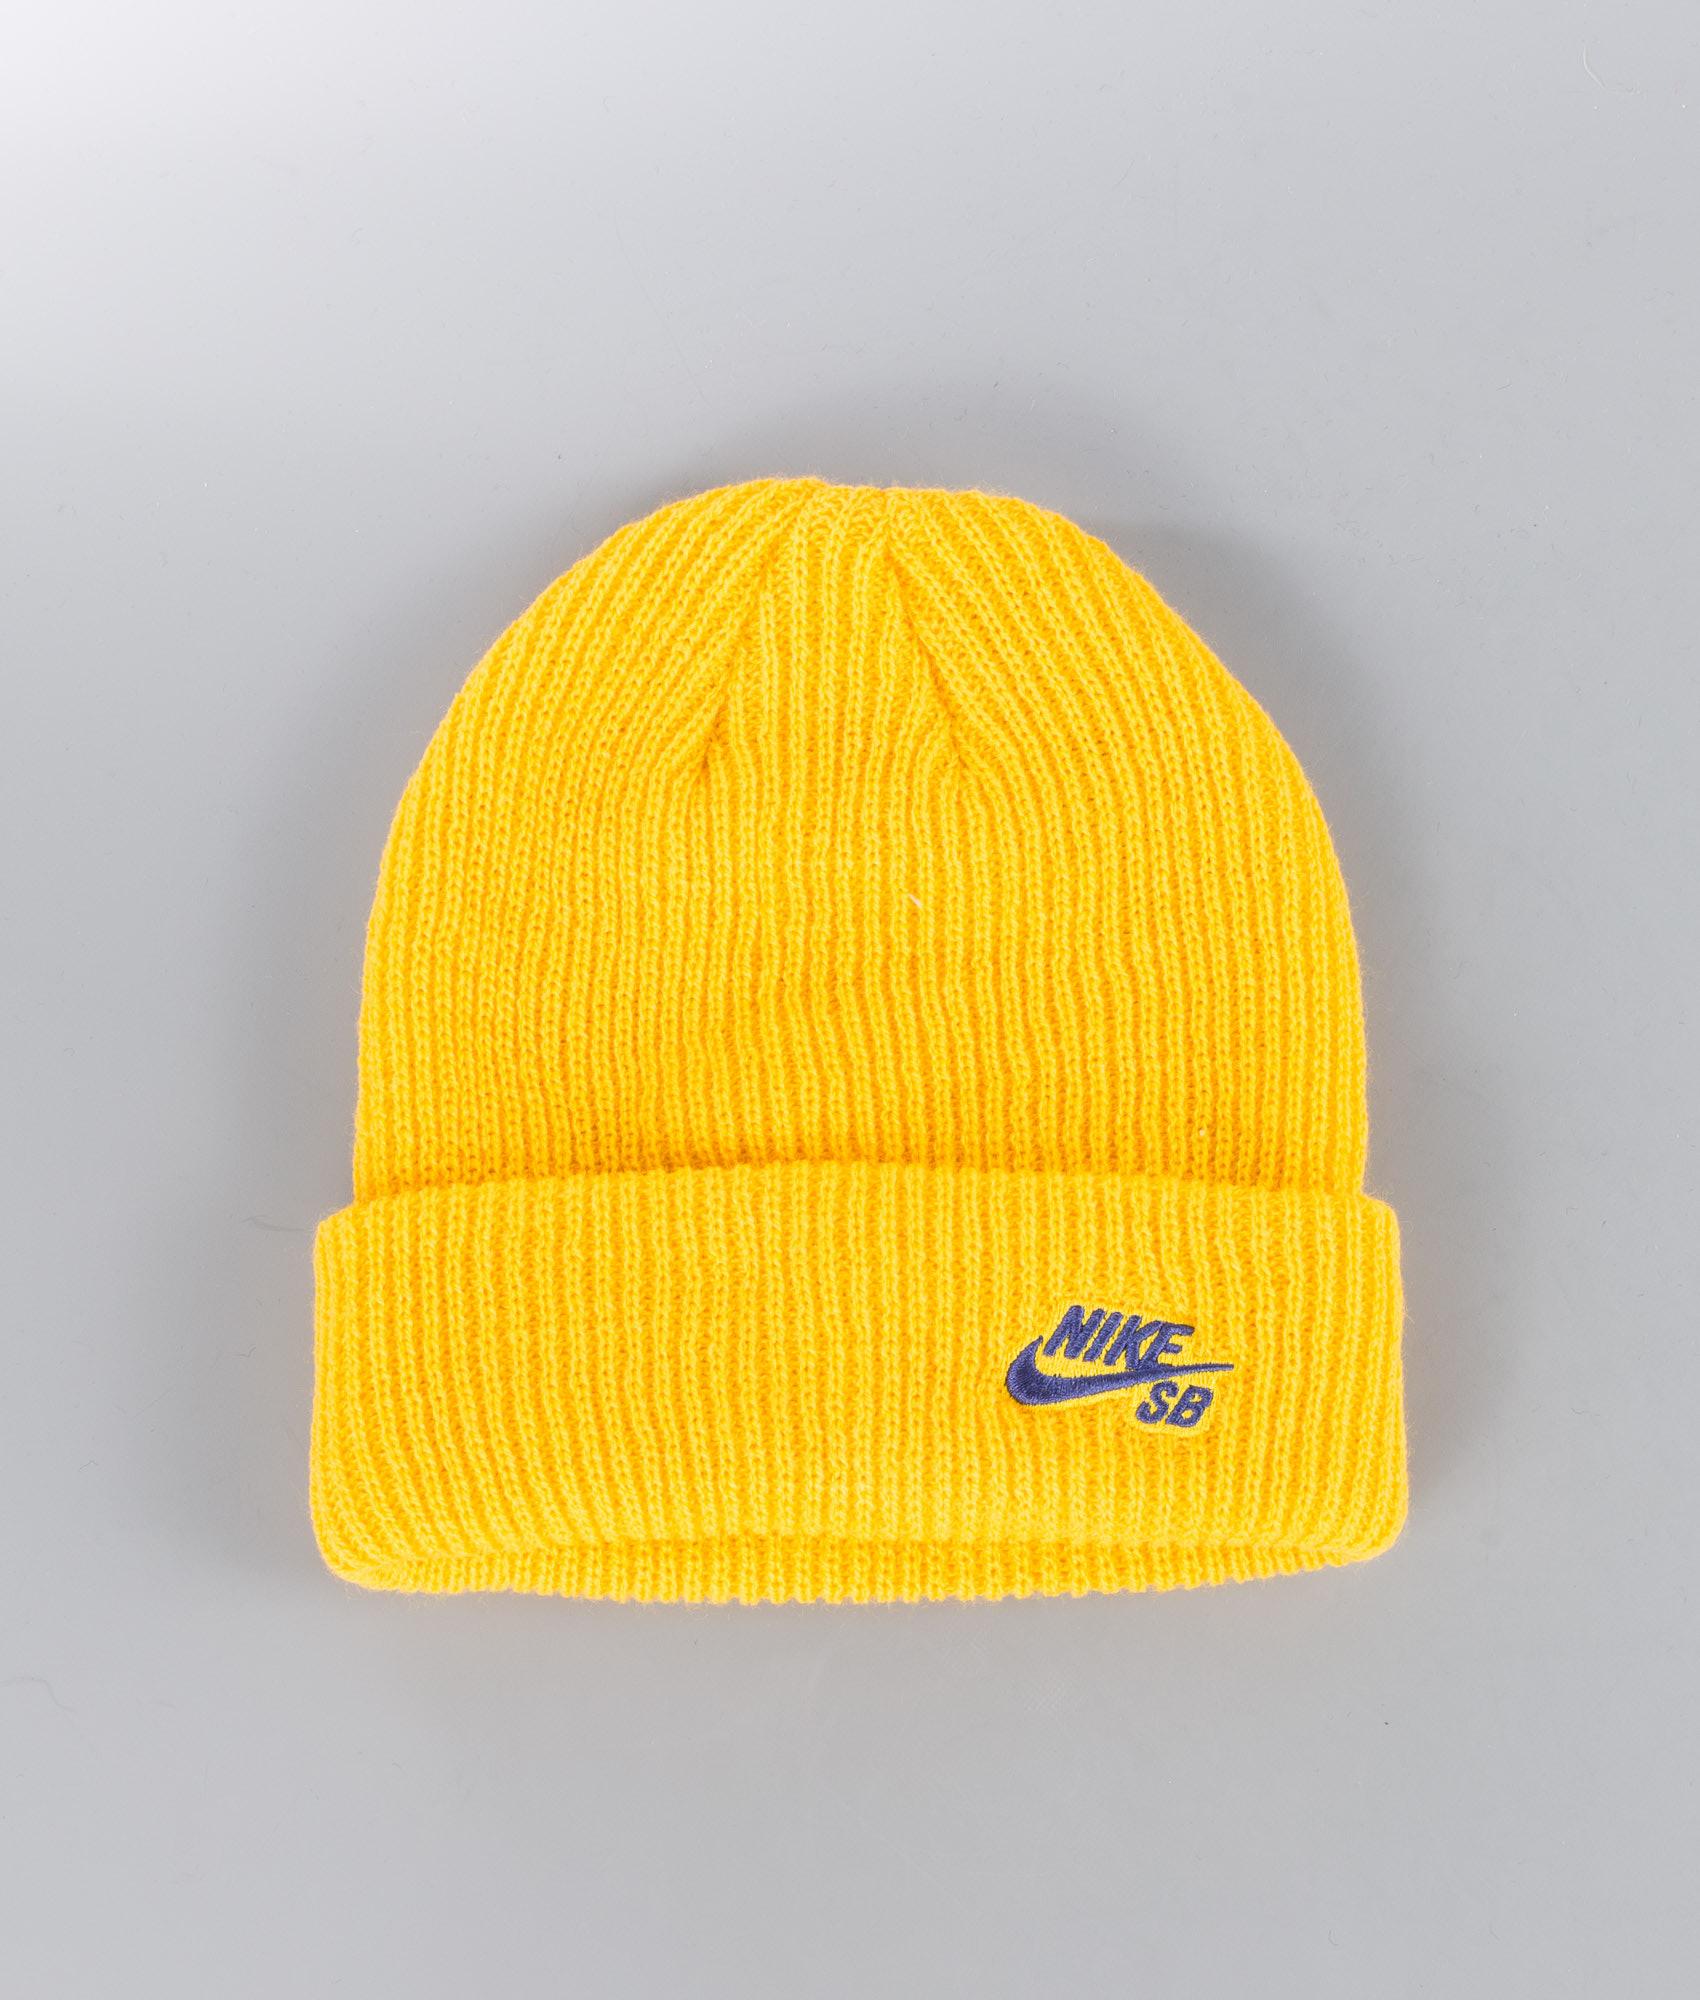 Nike Fisherman Beanie Yellow Ochre Blue Void - Ridestore.com 1cb5df4bf688